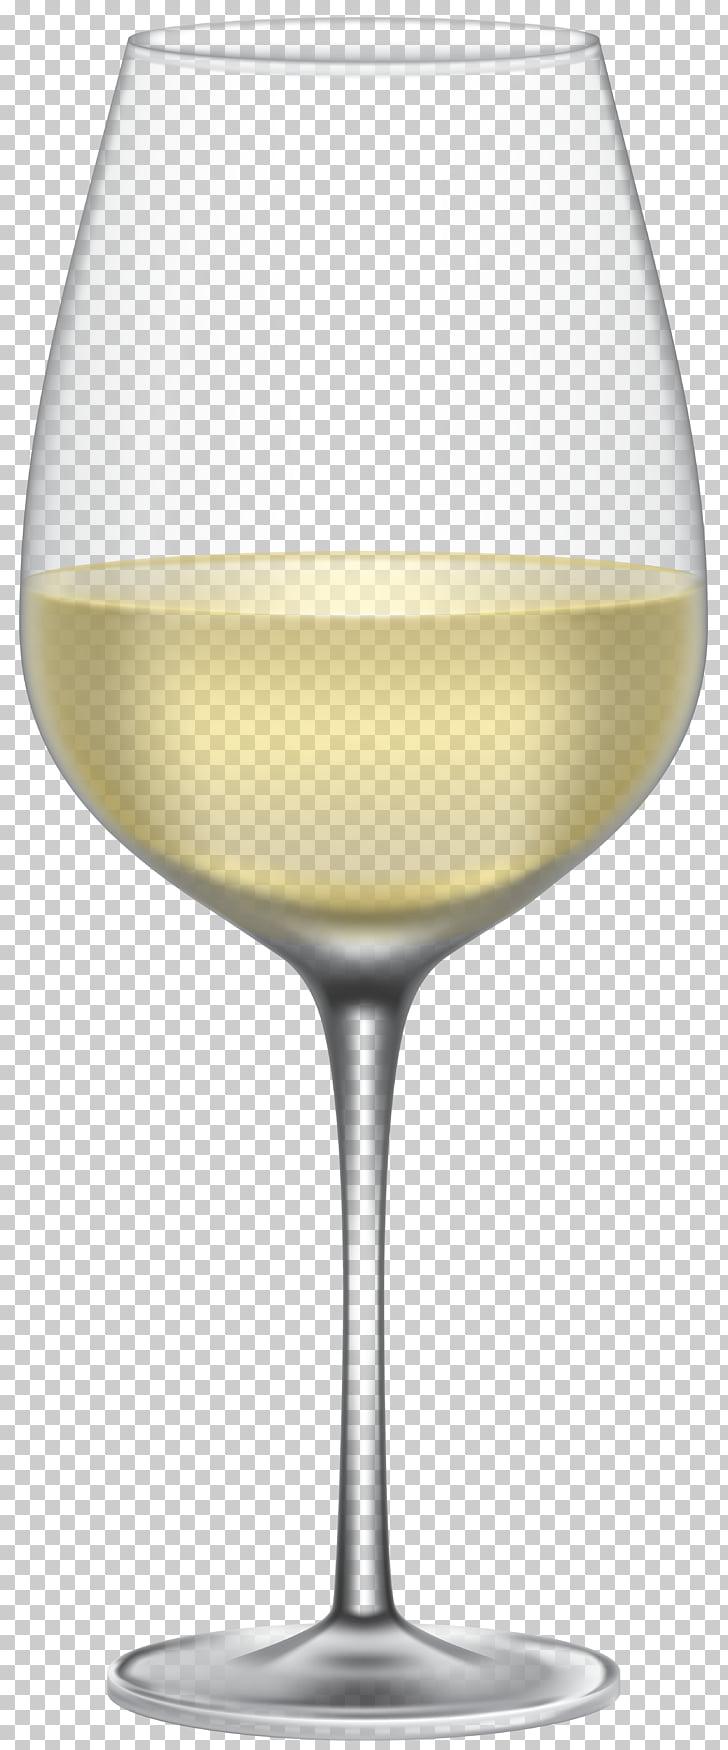 Red Wine White wine Cabernet Sauvignon Merlot, Glass of Red.